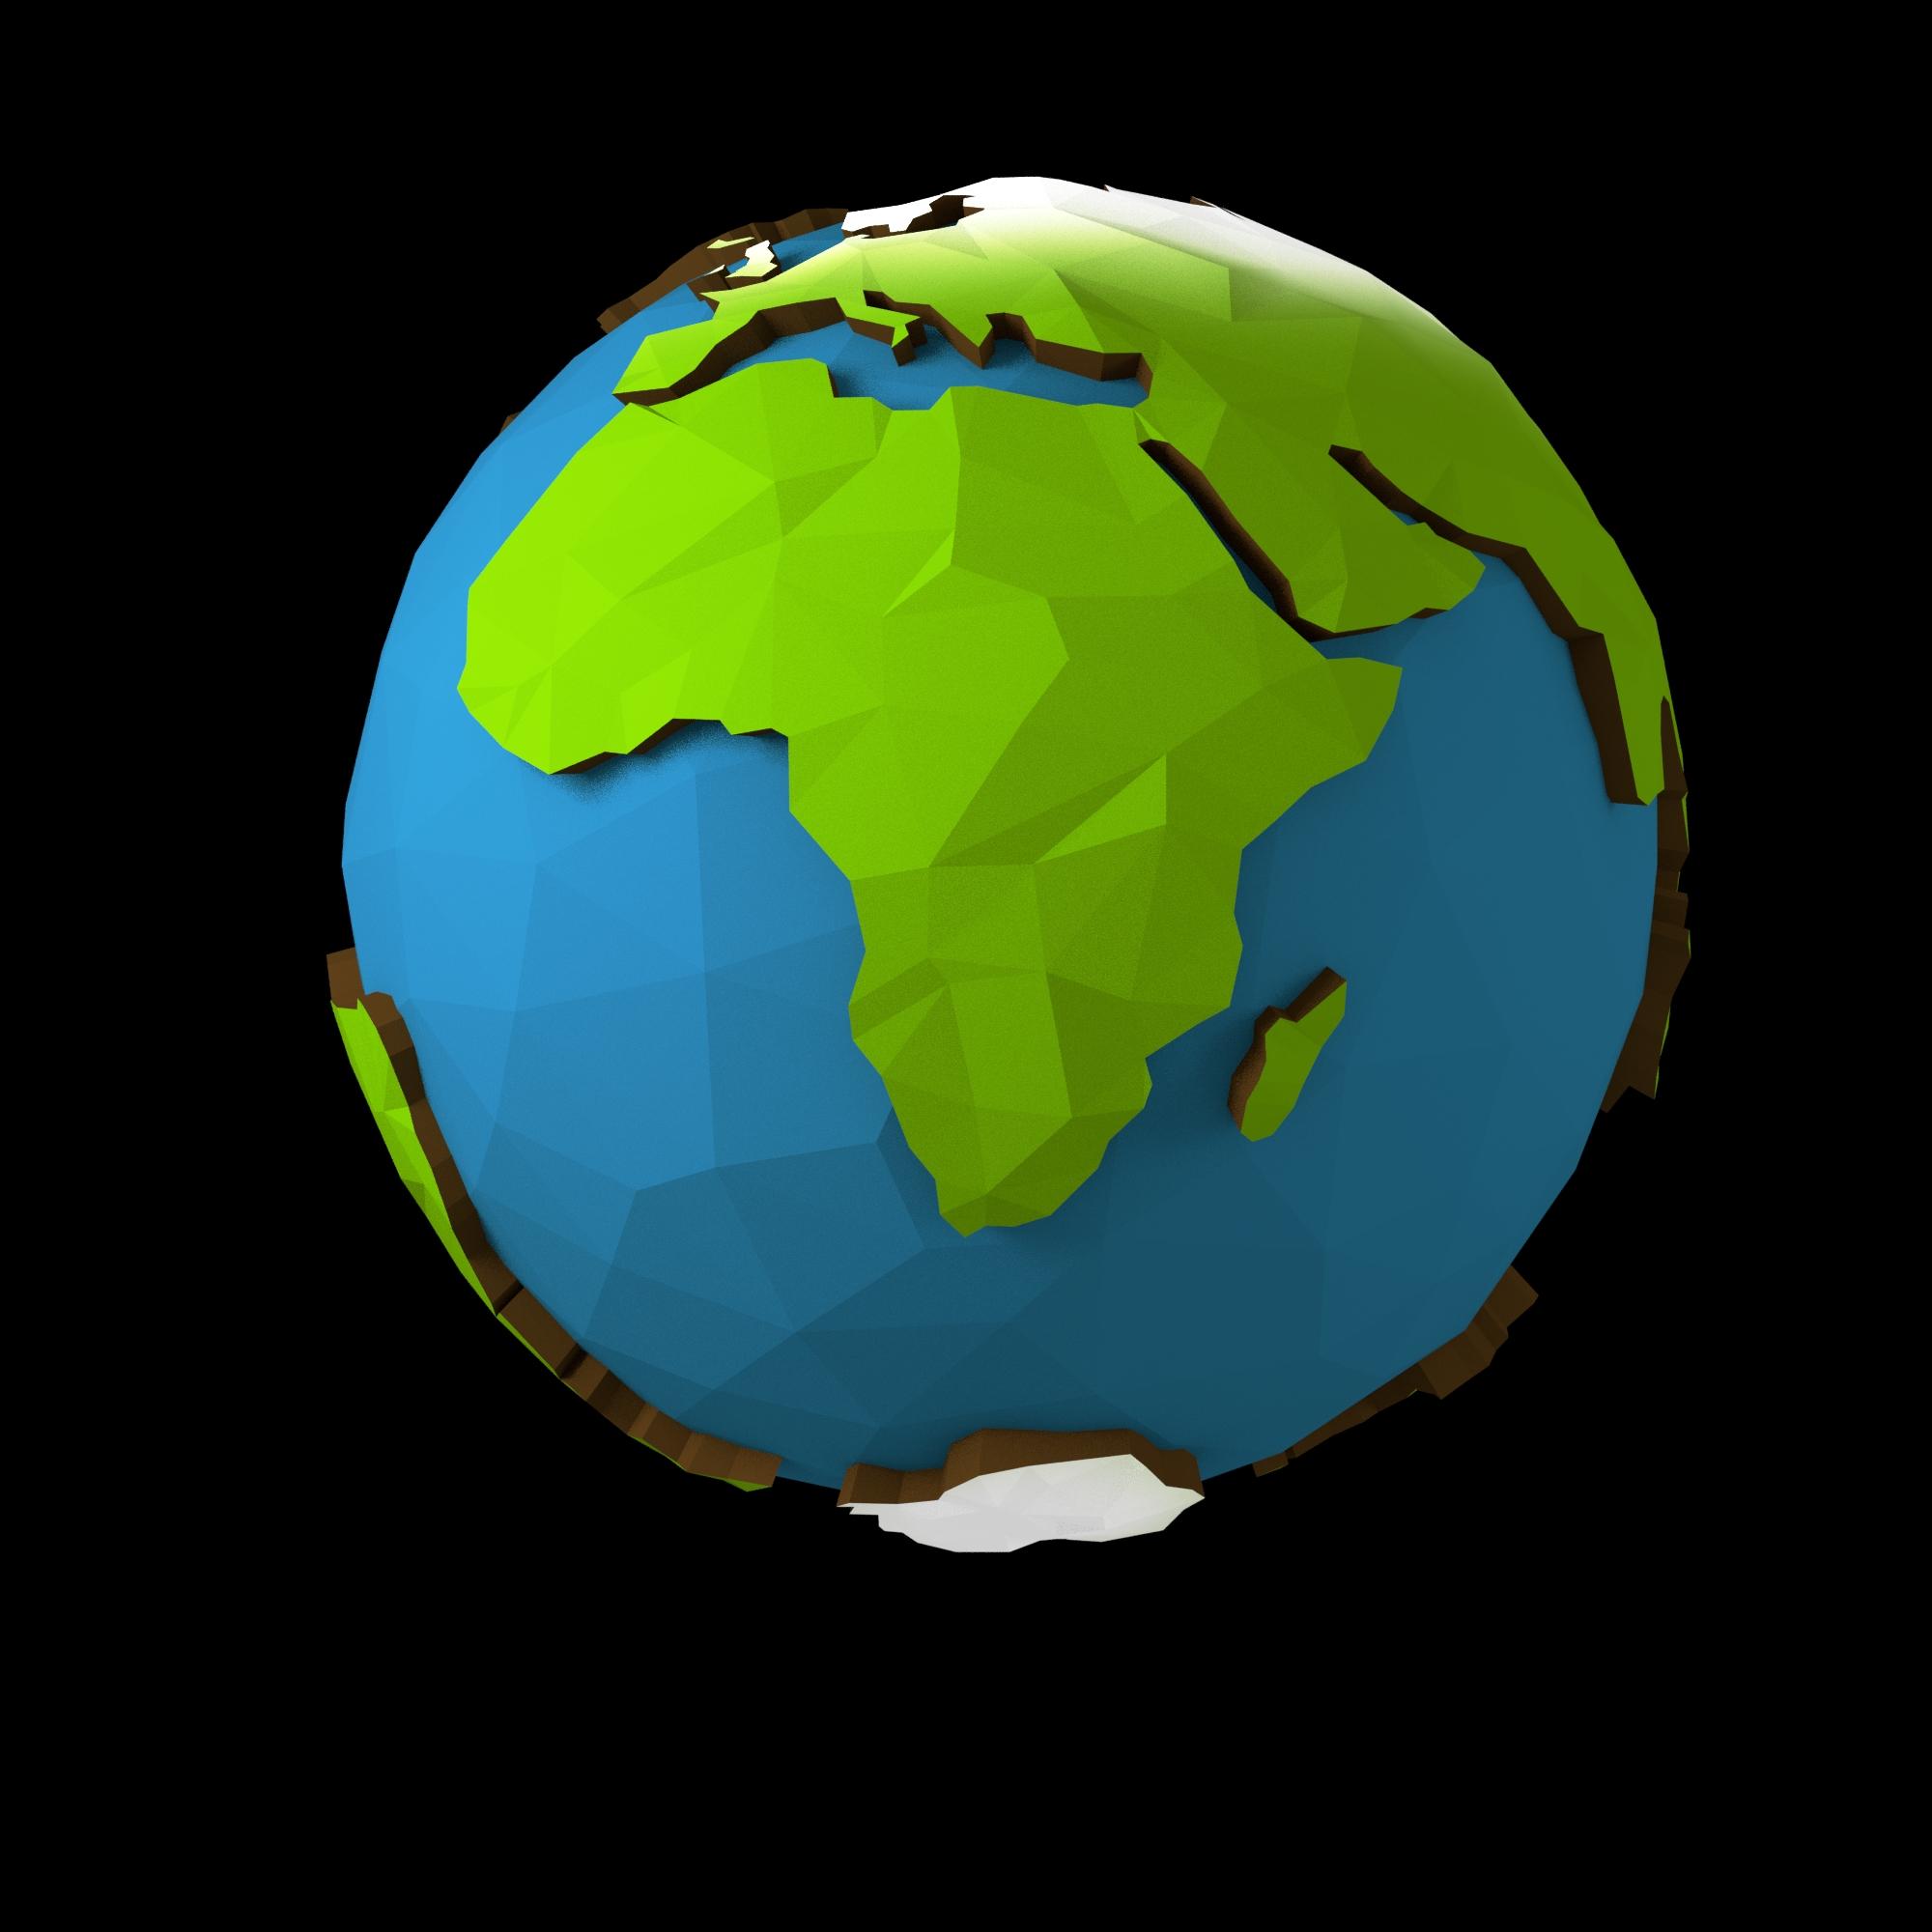 Low Poly Earth By Klockwork Studios 3docean